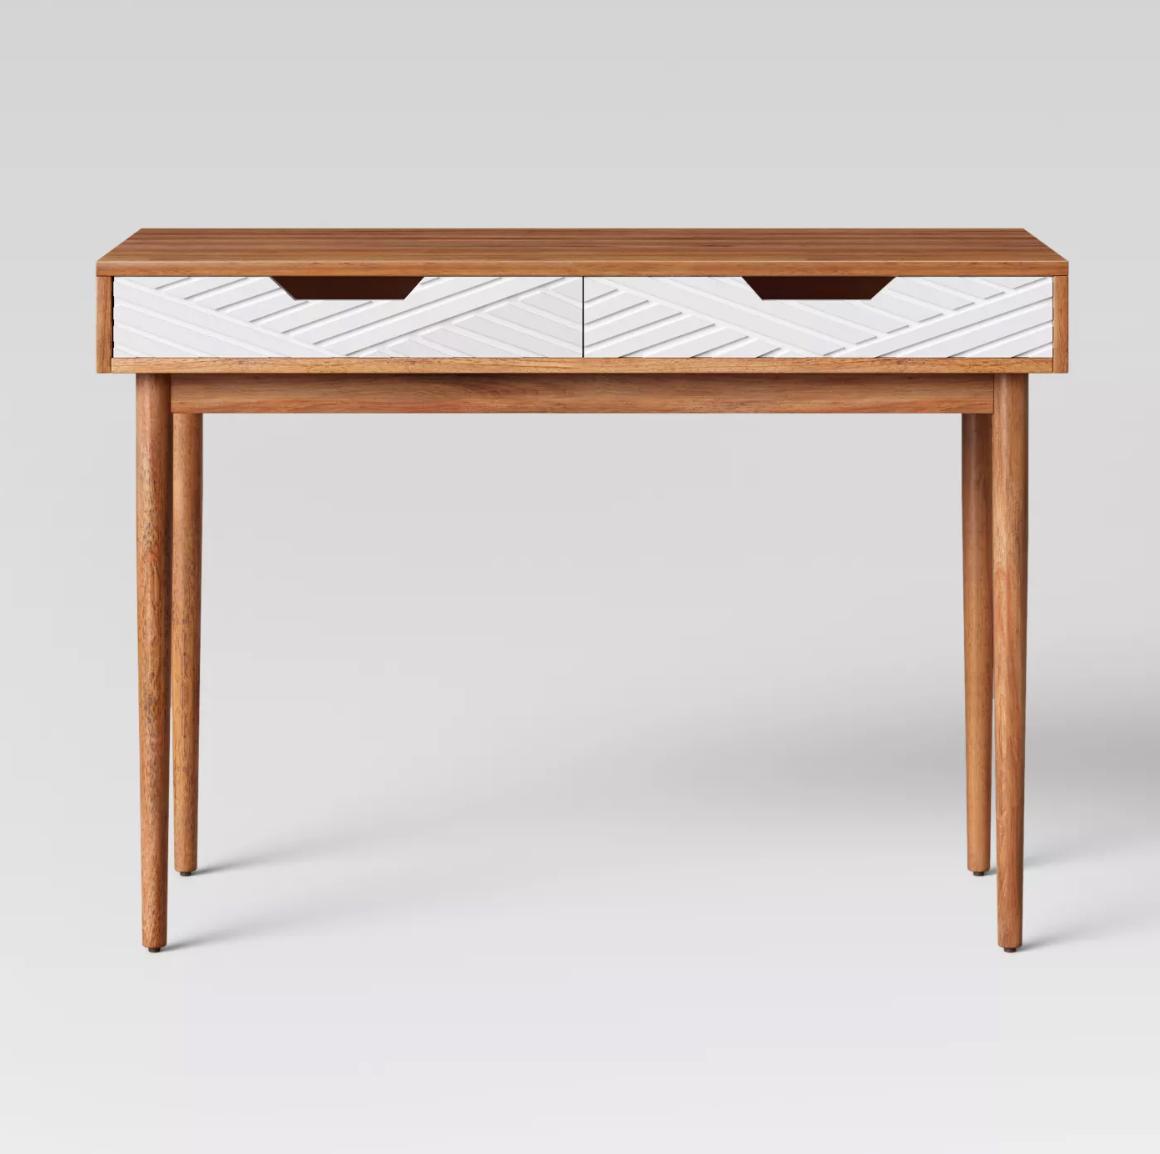 Target midcentury desk